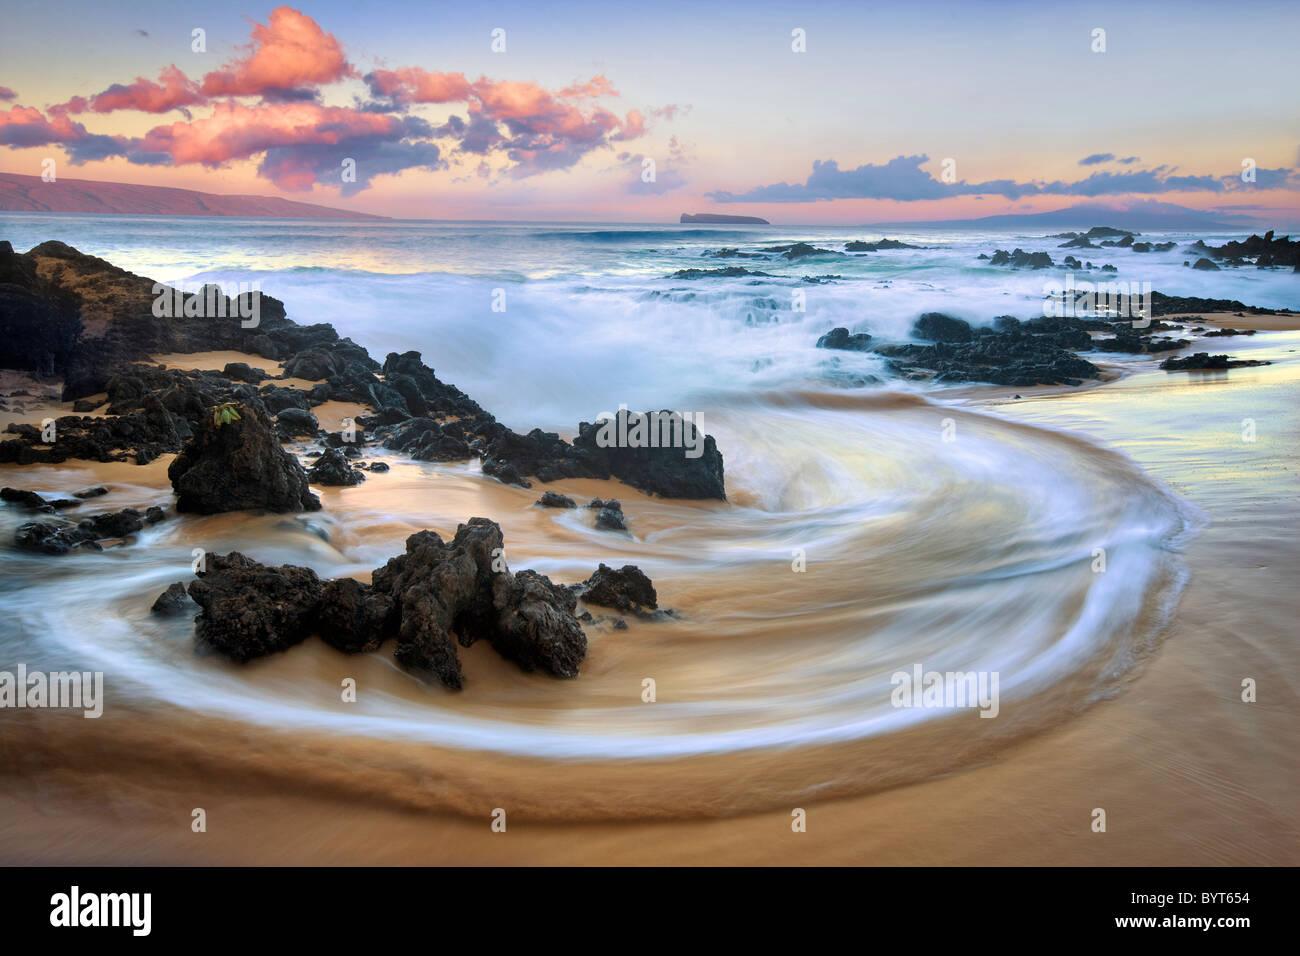 Wave-Muster und Sonnenaufgang Wolken. Maui, Hawaii Stockbild